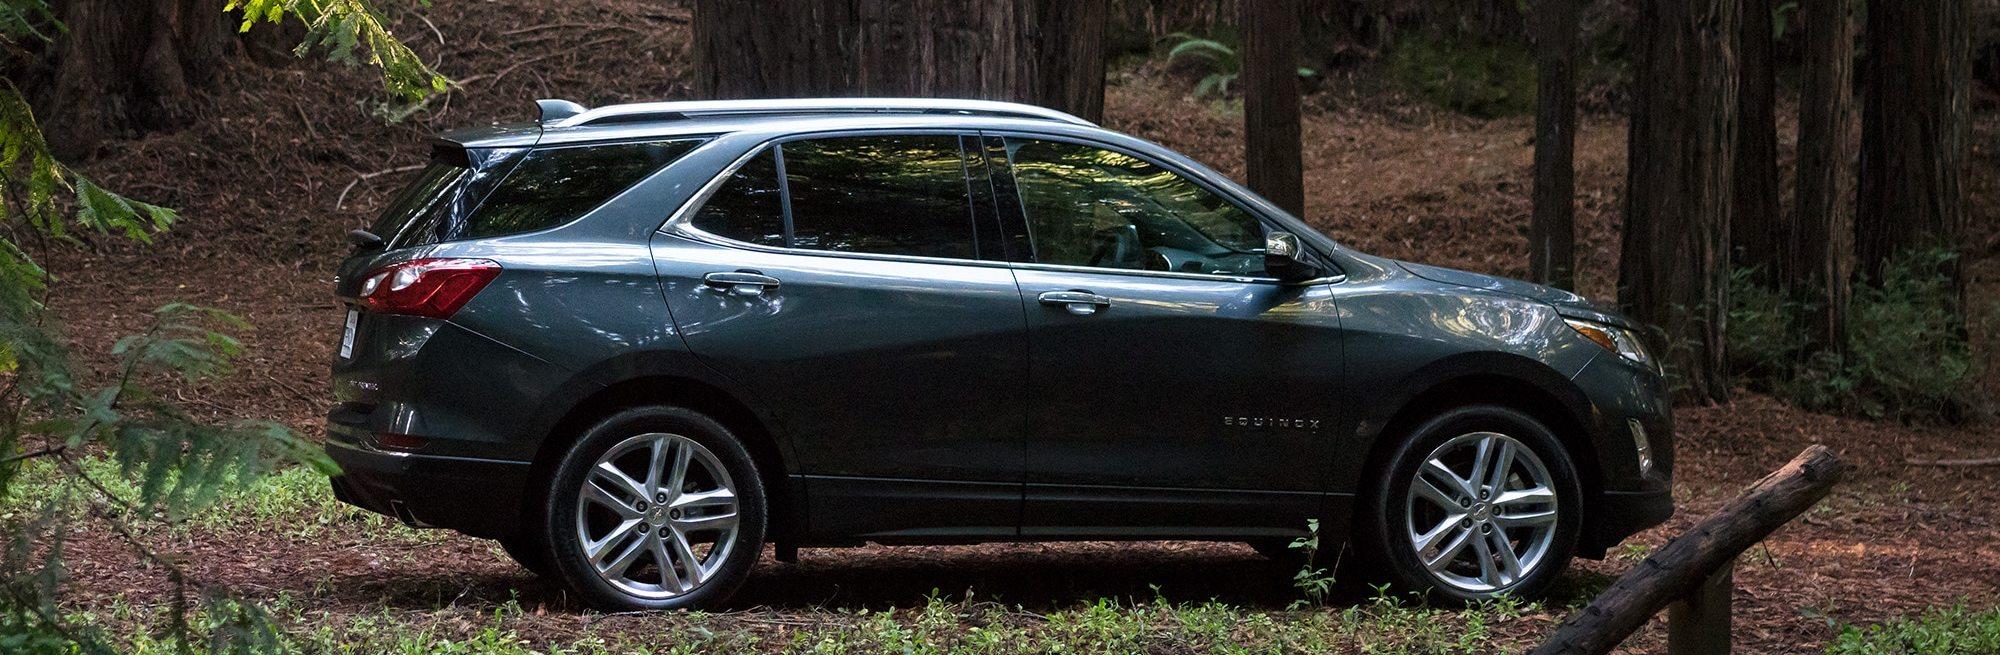 2020 Chevrolet Equinox for Sale near Detroit, MI